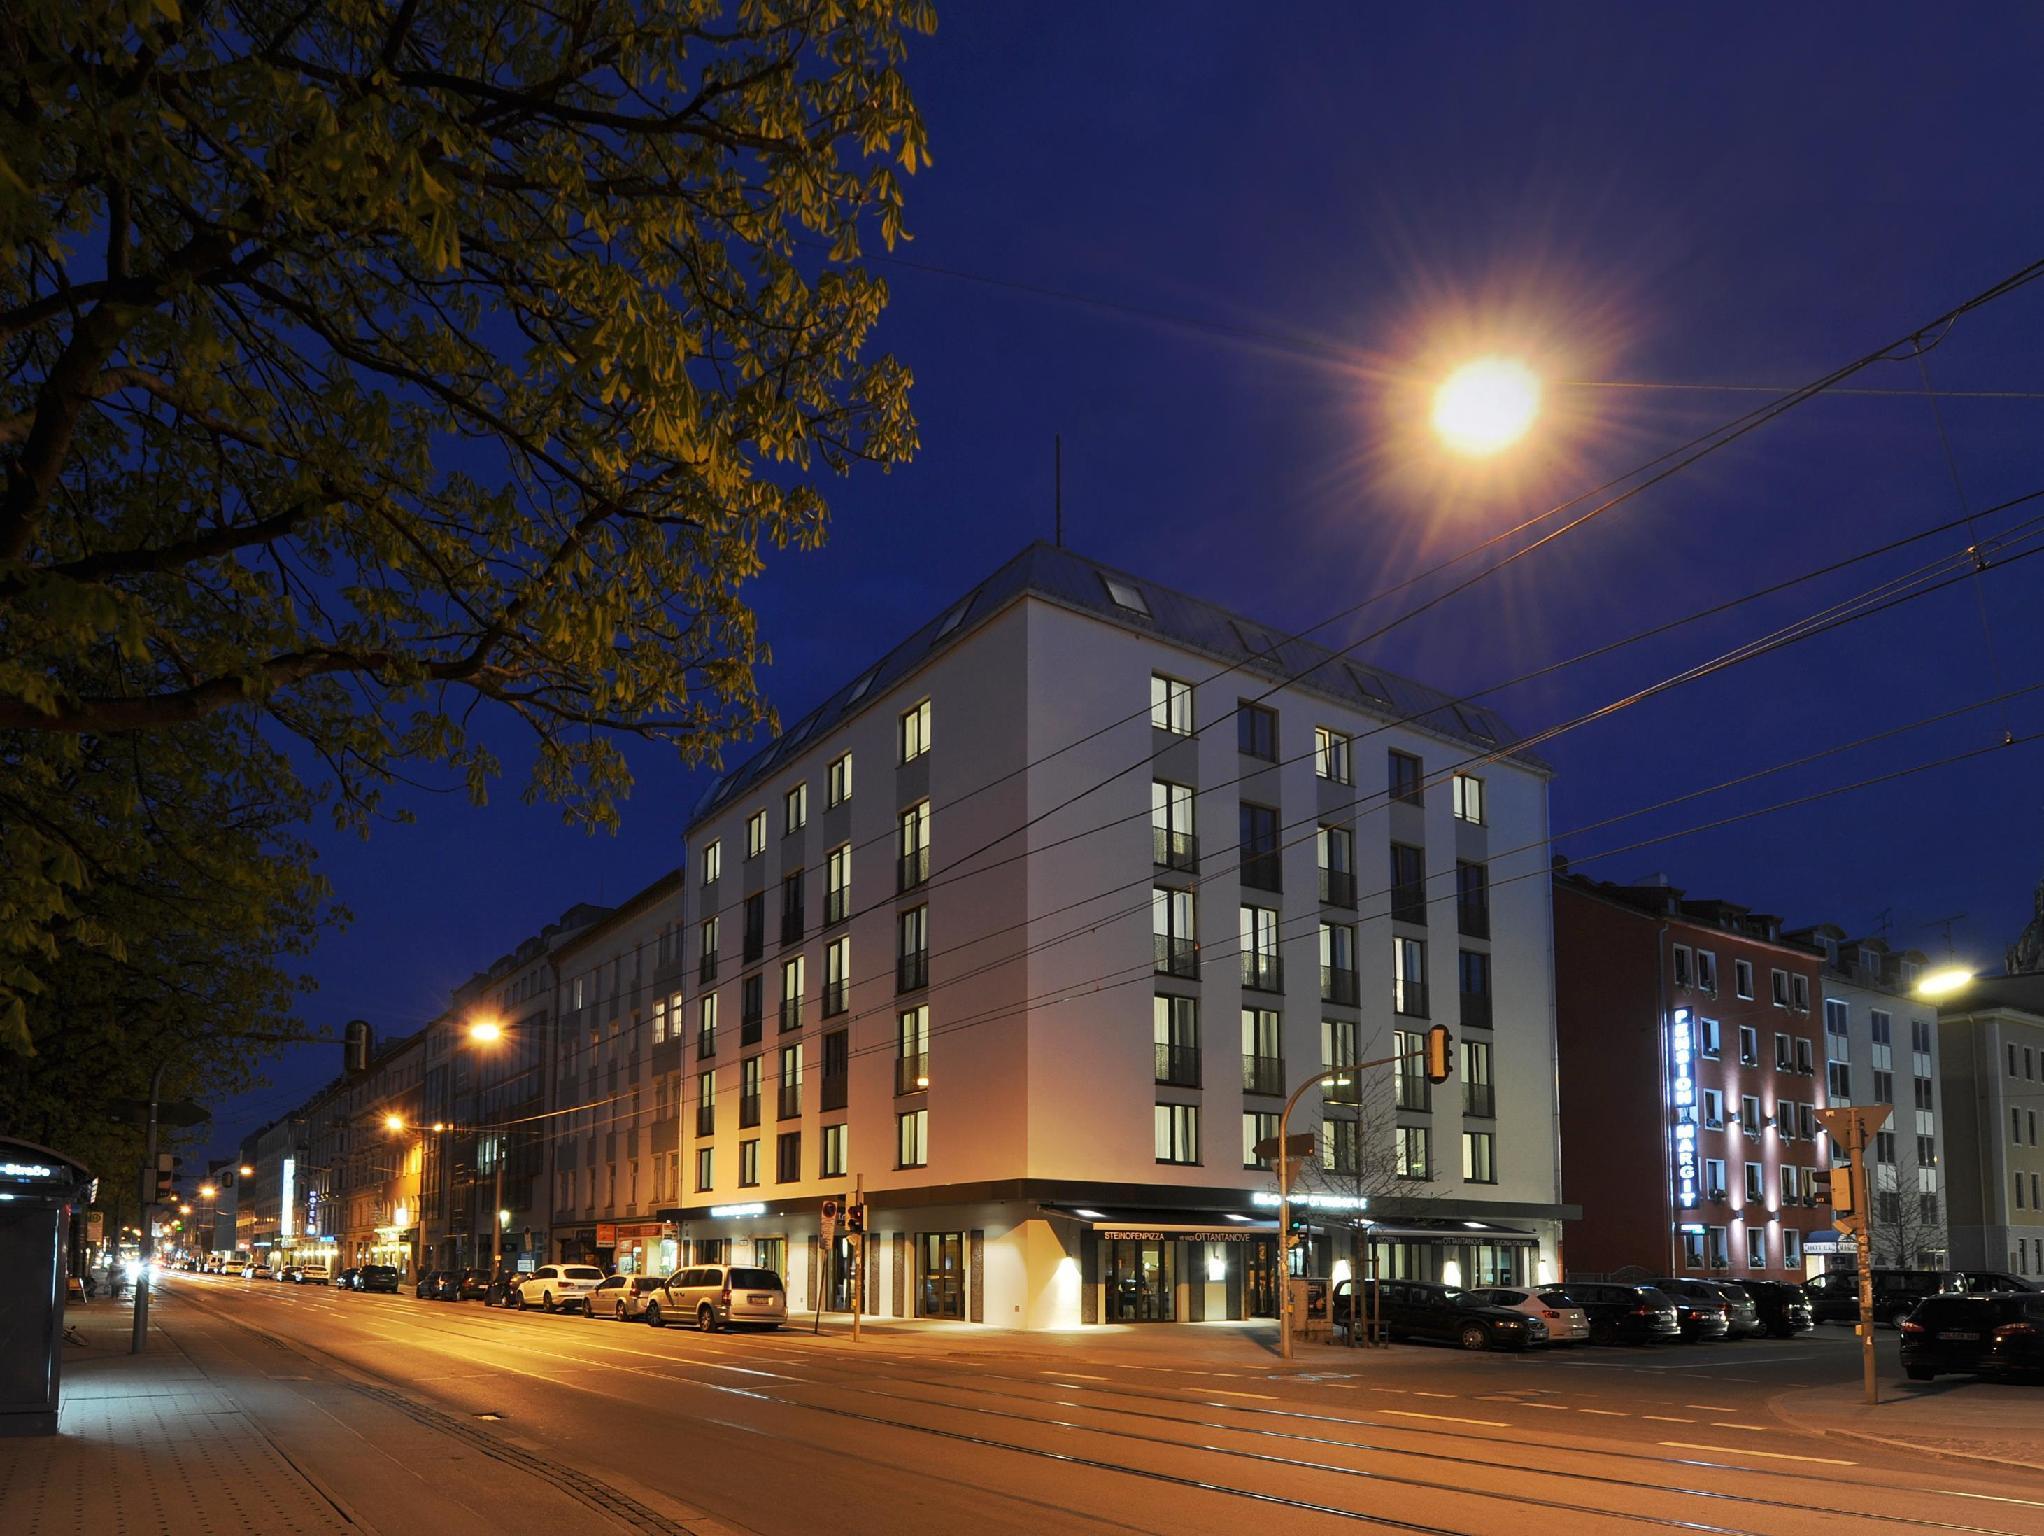 Vi Vadi Hotel Bayer 89  U05d4 U05de U05d7 U05d9 U05e8  U05d4 U05d6 U05d5 U05dc  U05d1 U05d9 U05d5 U05ea U05e8